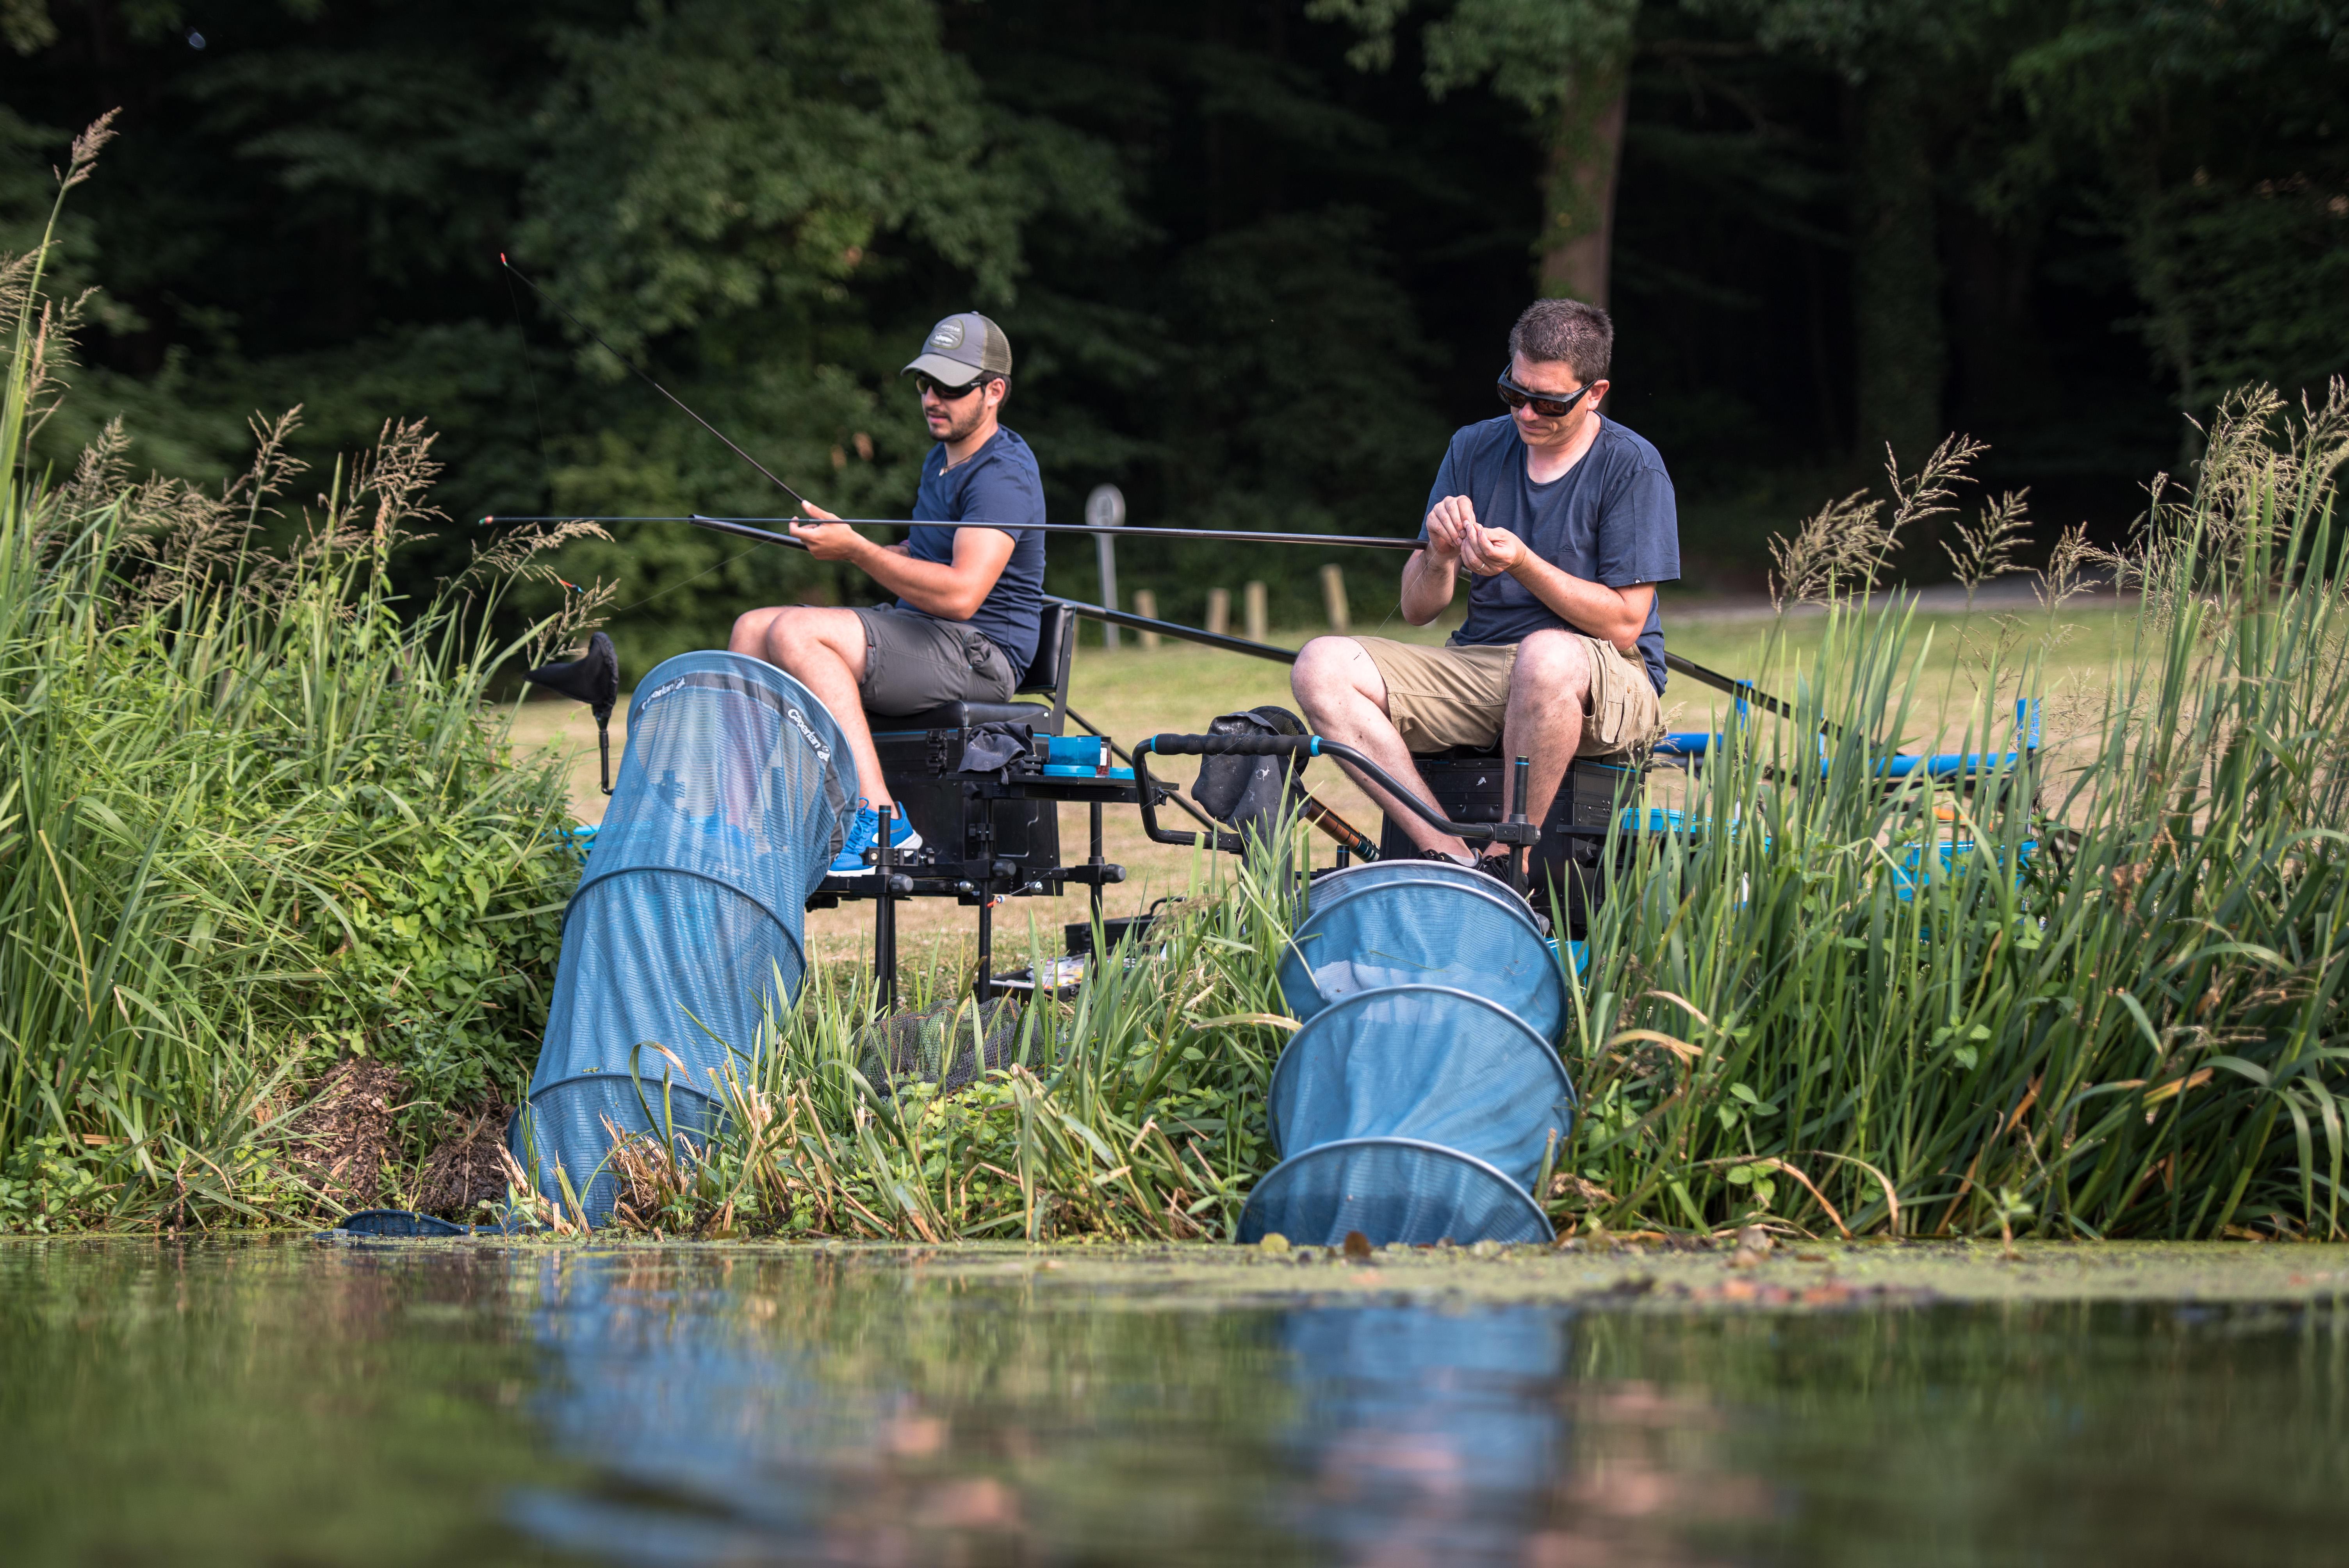 GEAR TO BEGIN LEDGERING FISHING